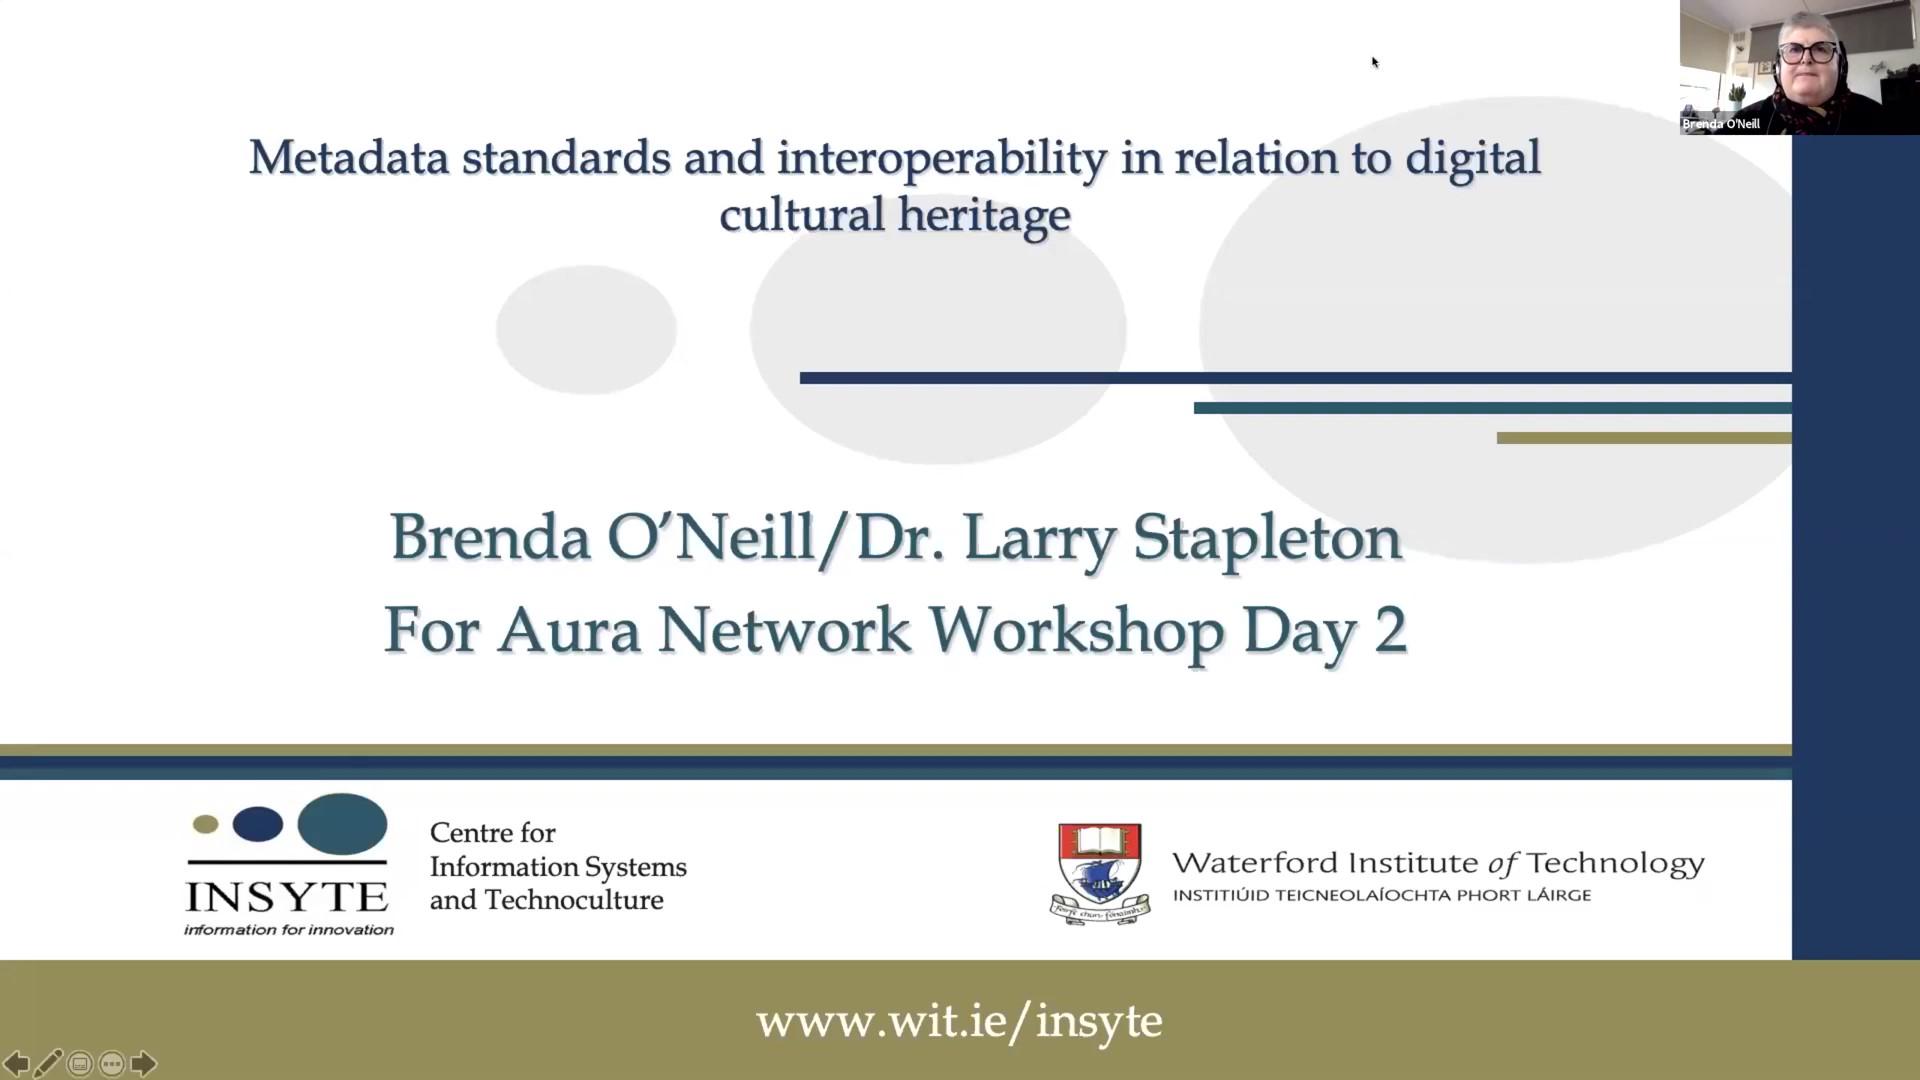 Workshop 1 – Brenda O'Neill – Metadata standards & interoperability in relation to digital cultural heritage